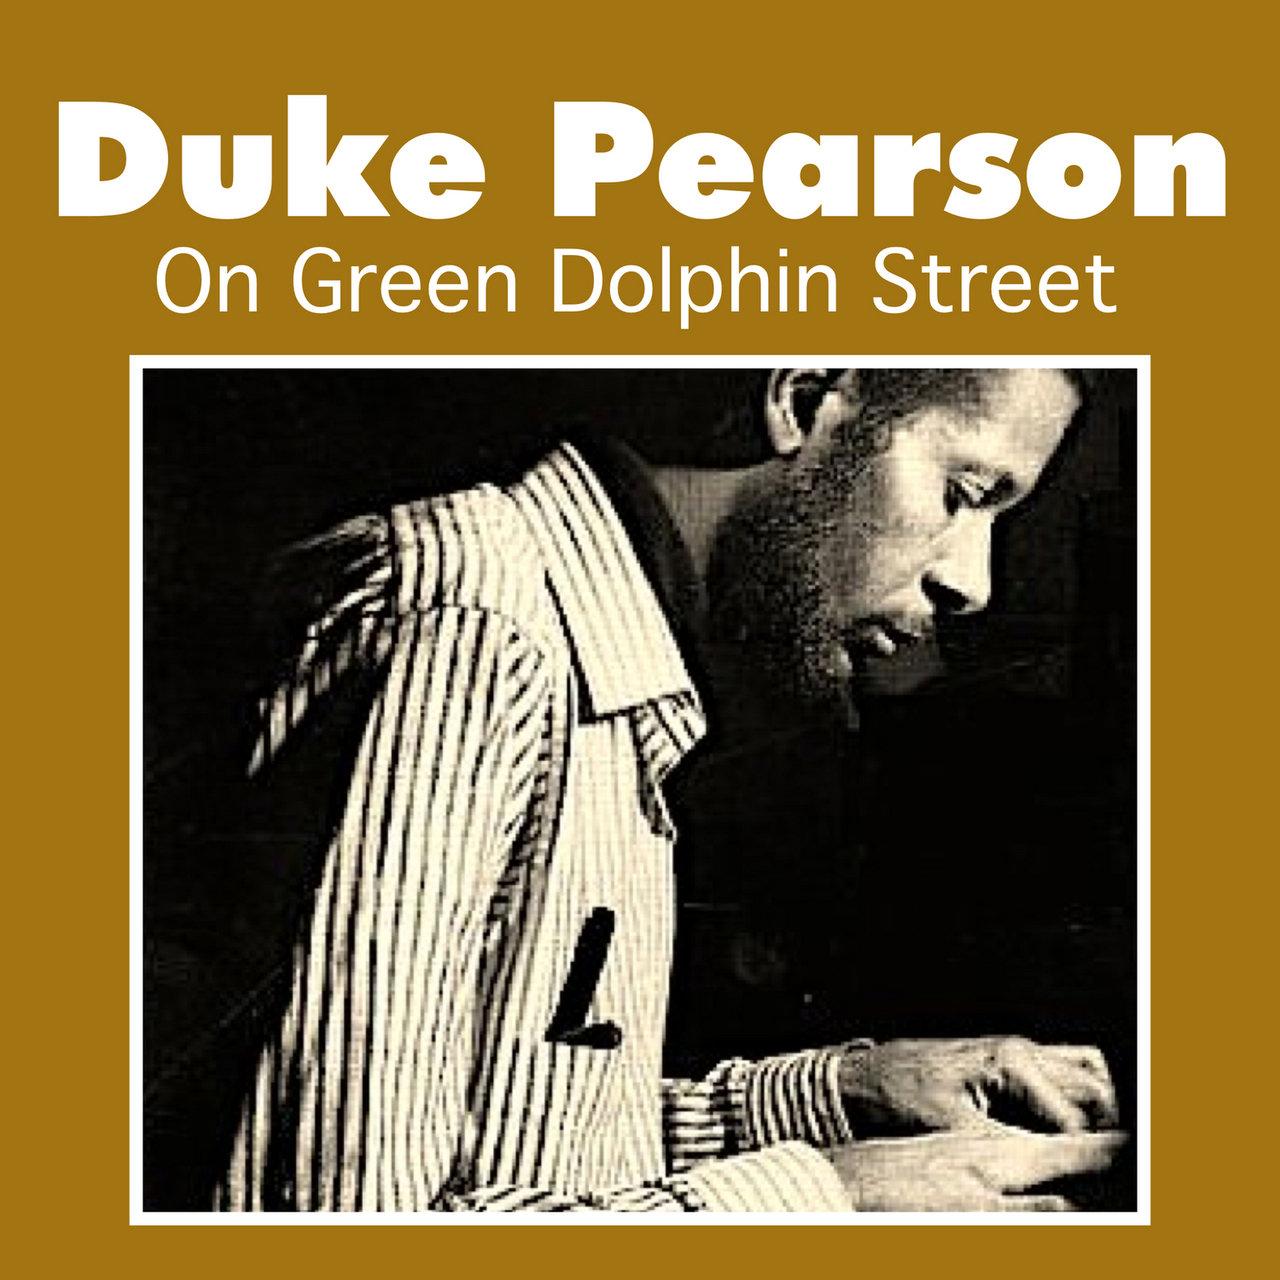 DUKE PEARSON - On Green Dolphin Street cover